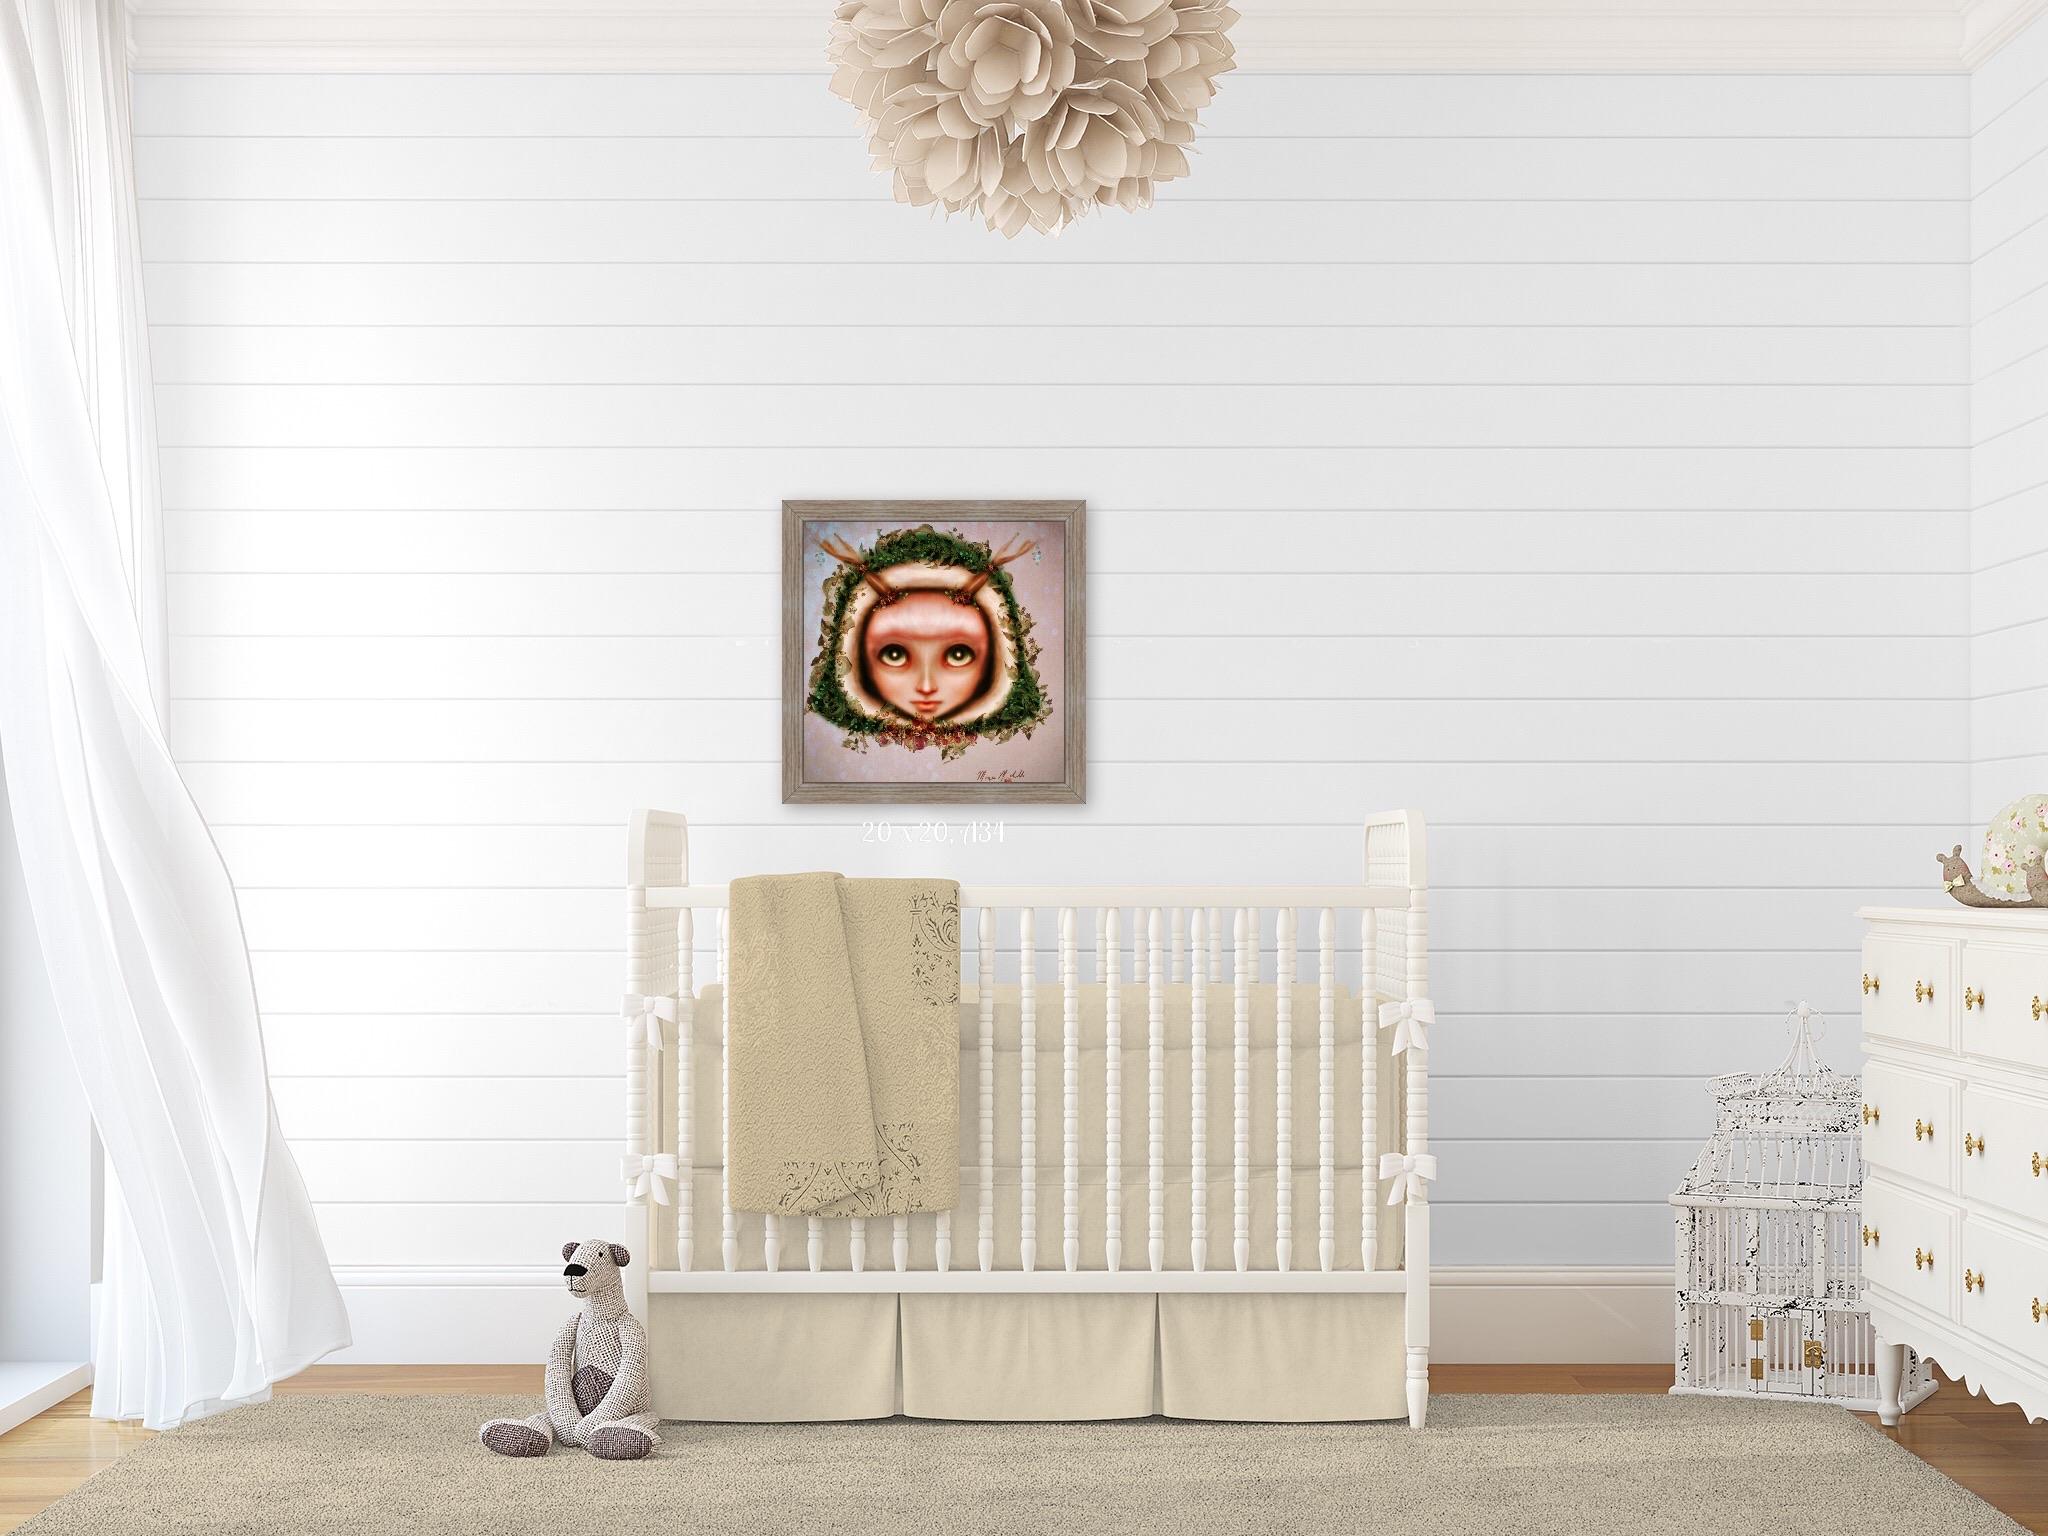 Shiplap Nursery Wall Art Forest Theme